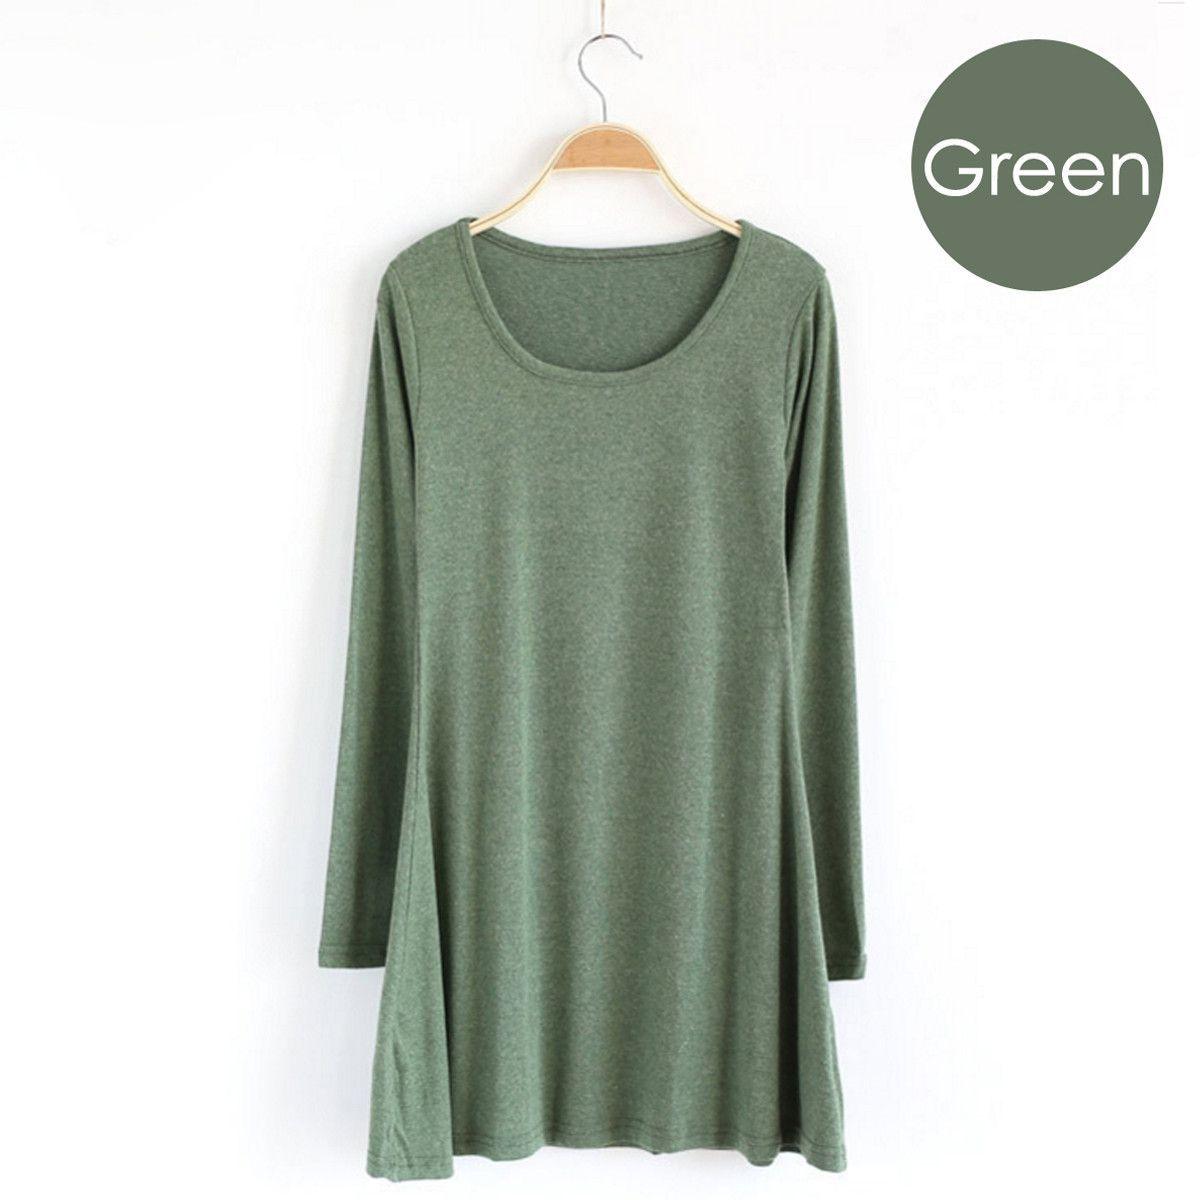 f5b2f41ebafc0 Cute   Comfy ~ Green long-sleeve jersey knit dress. Soft cotton knit casual  easy-to-wear mini dress,